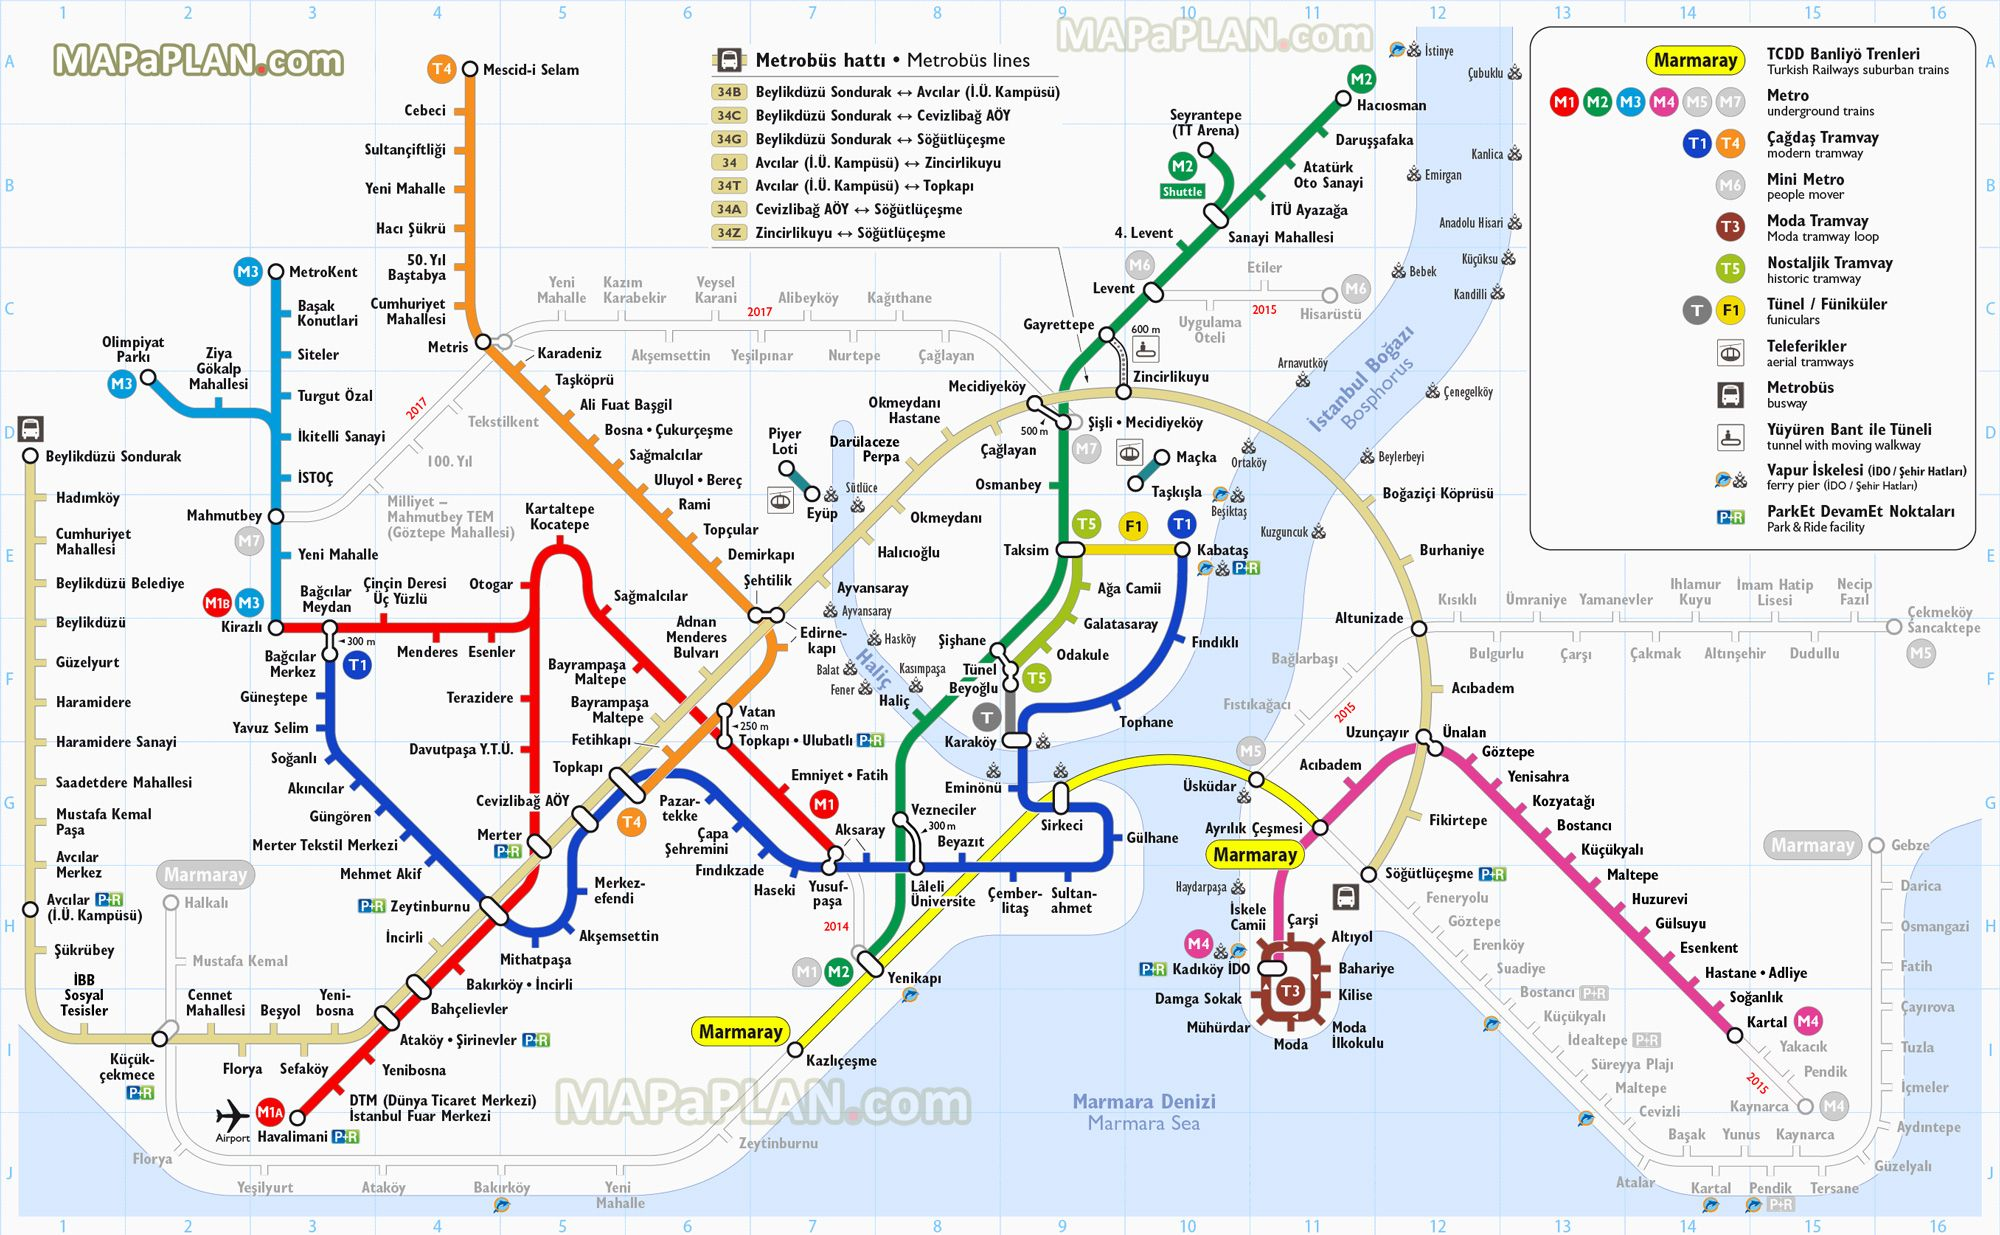 Istanbul Subway Map 2015.Metro Metrosu Railway Train Station Tram Istanbul Ulasim Rapid